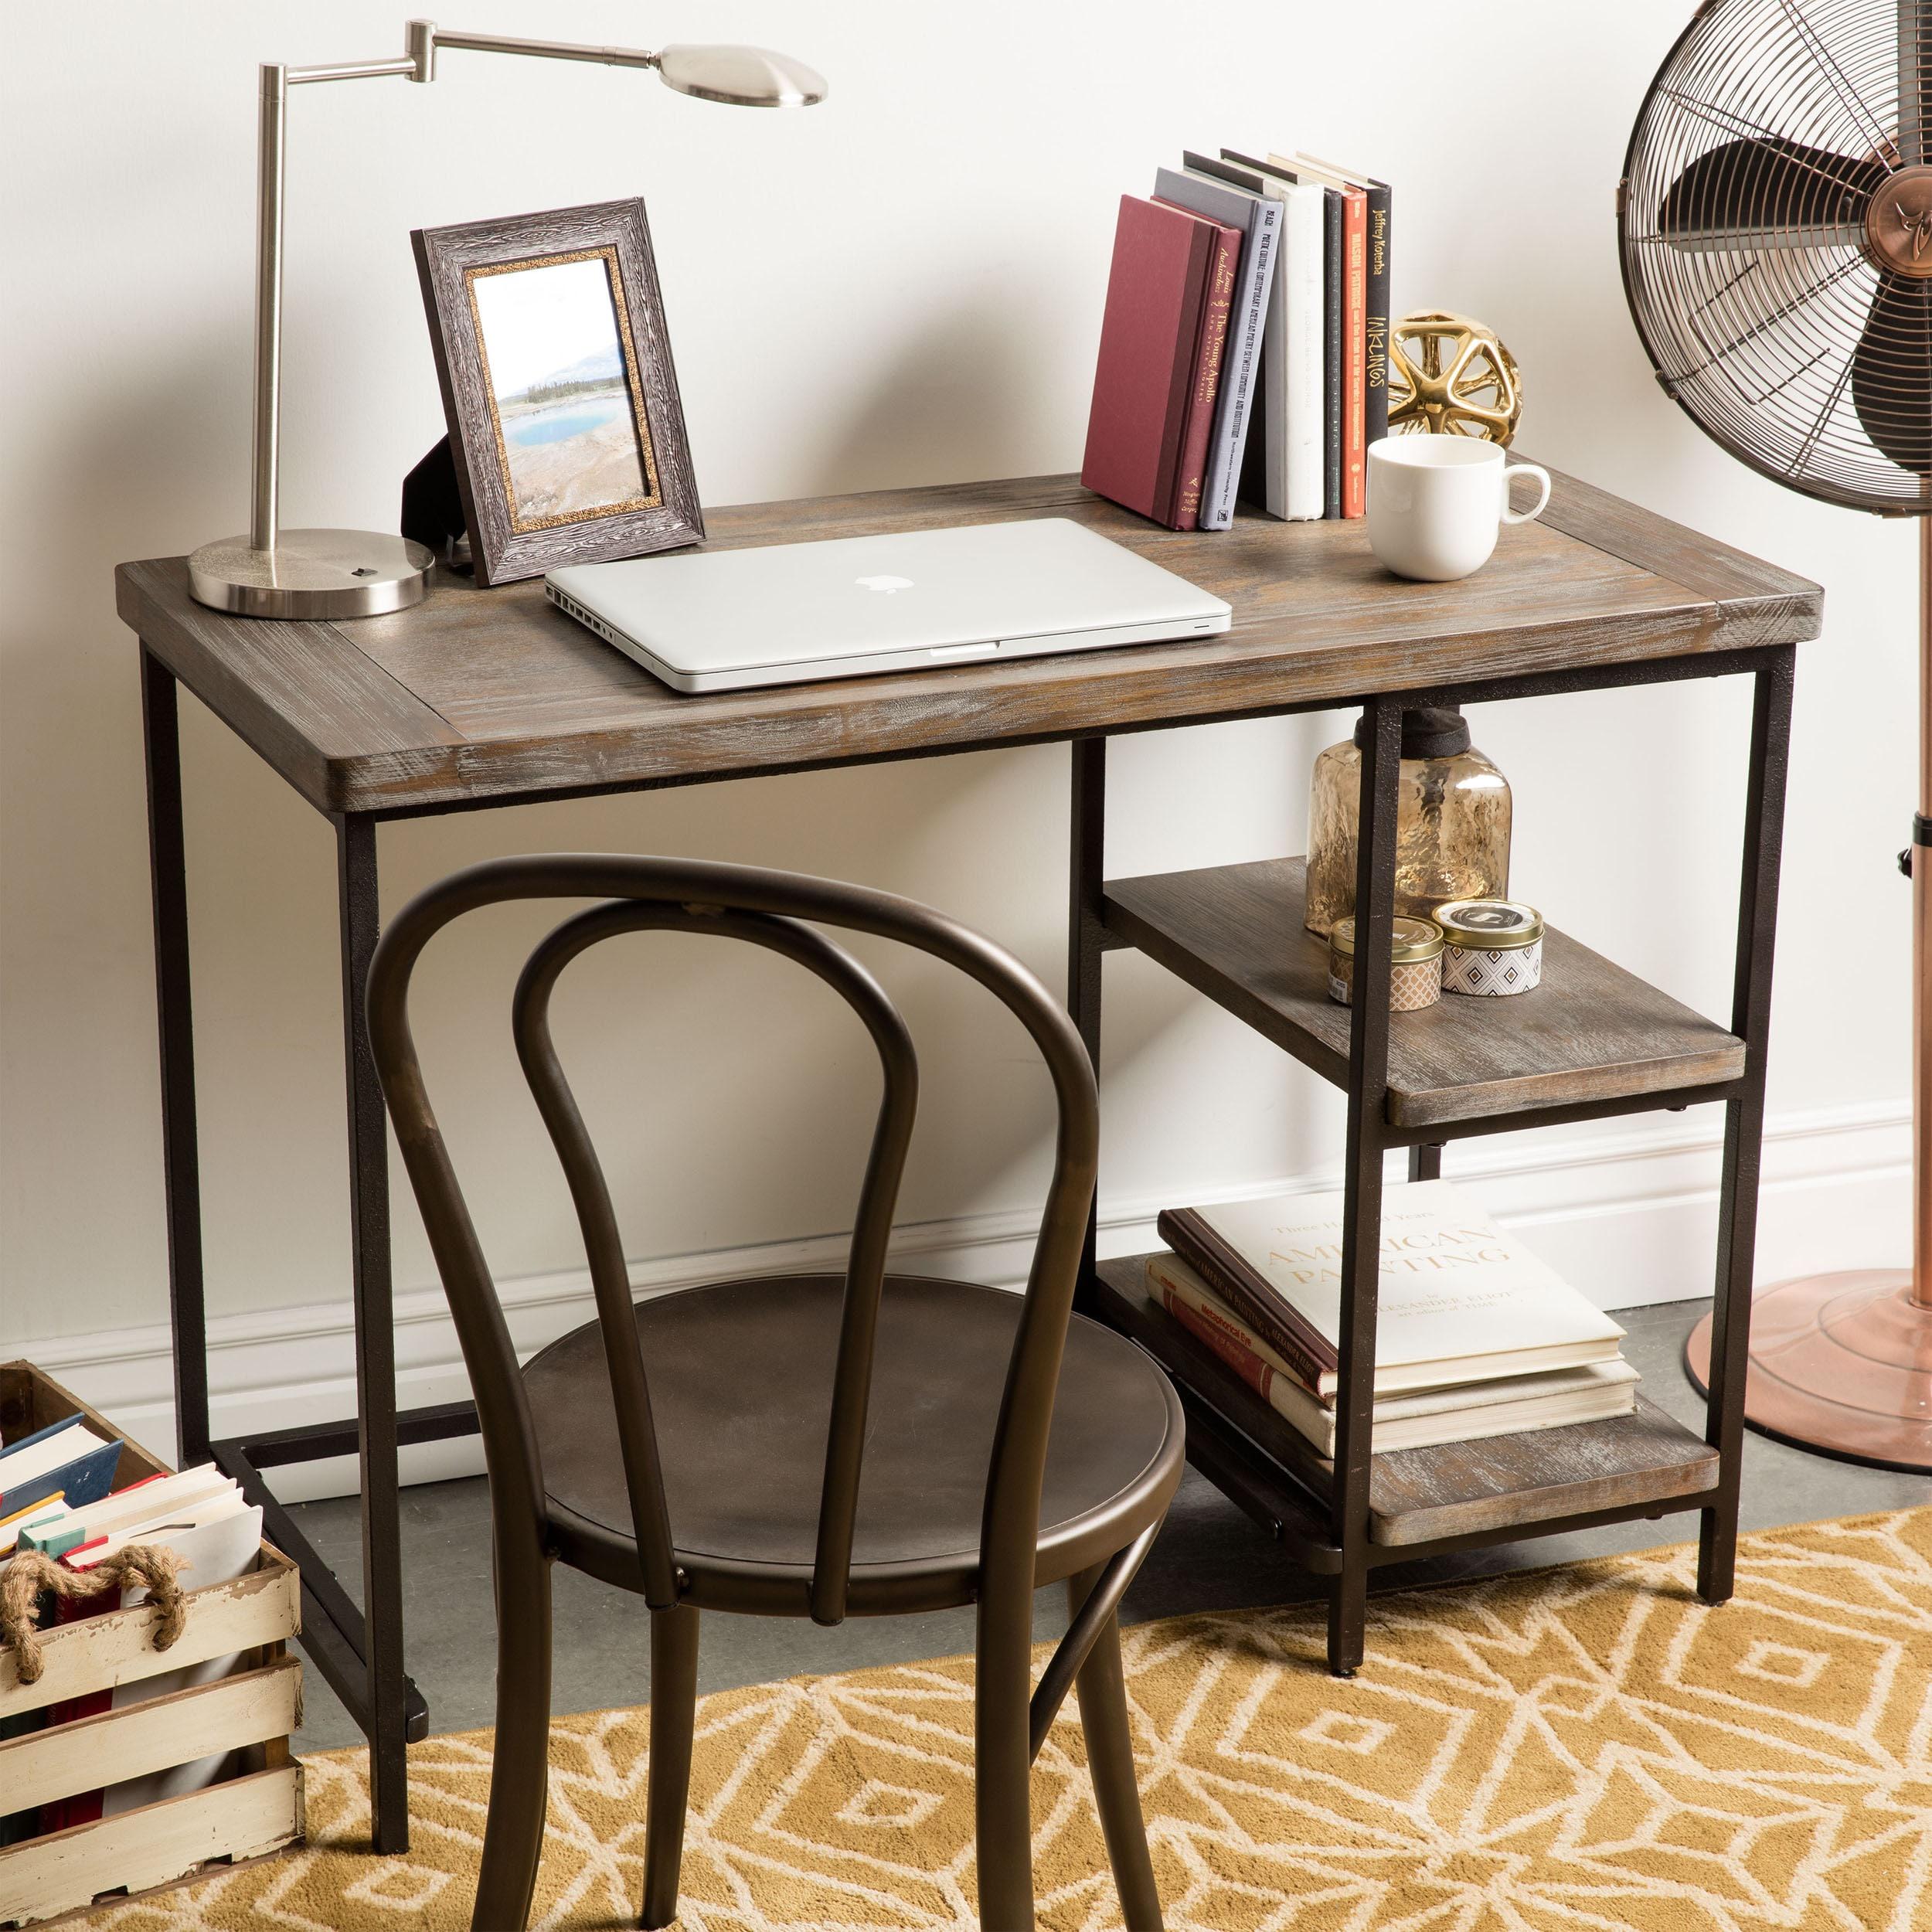 Shop Stones U0026 Stripes Renate Distressed Grey Slim Writing Desk   Free  Shipping Today   Overstock.com   8206216